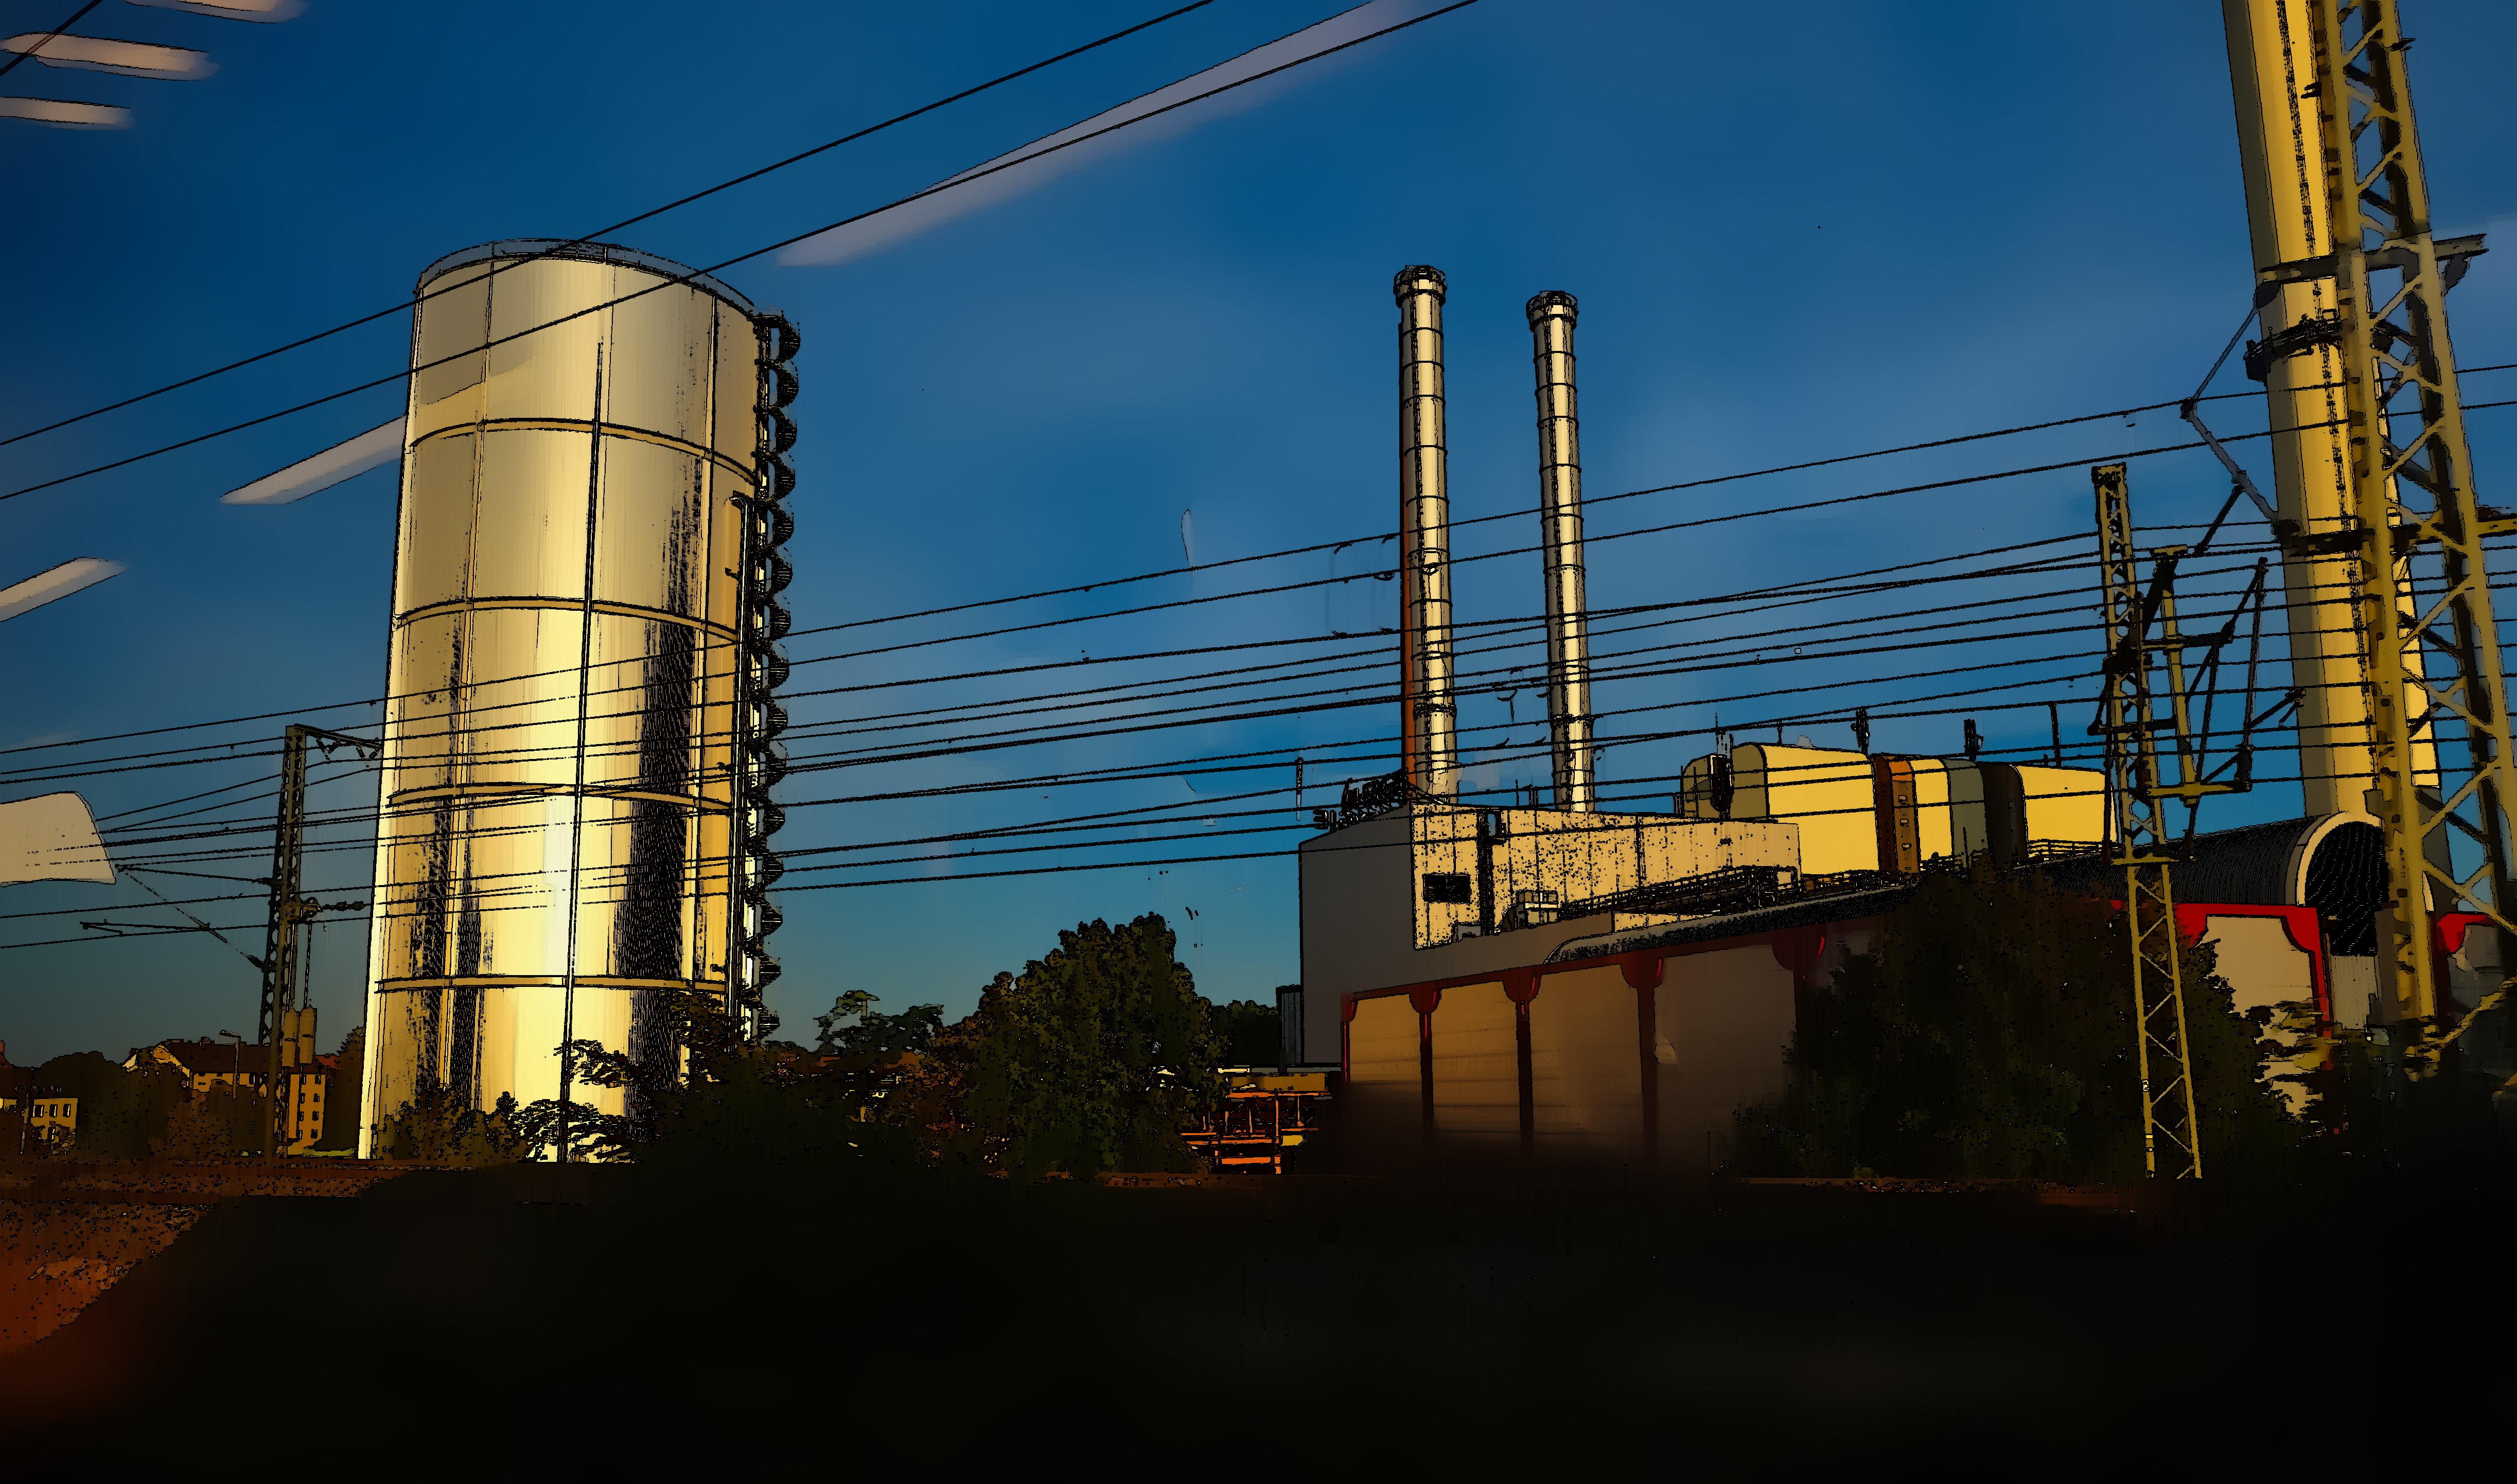 Nürnberger Kraftwerk / Nuremberg powerstation